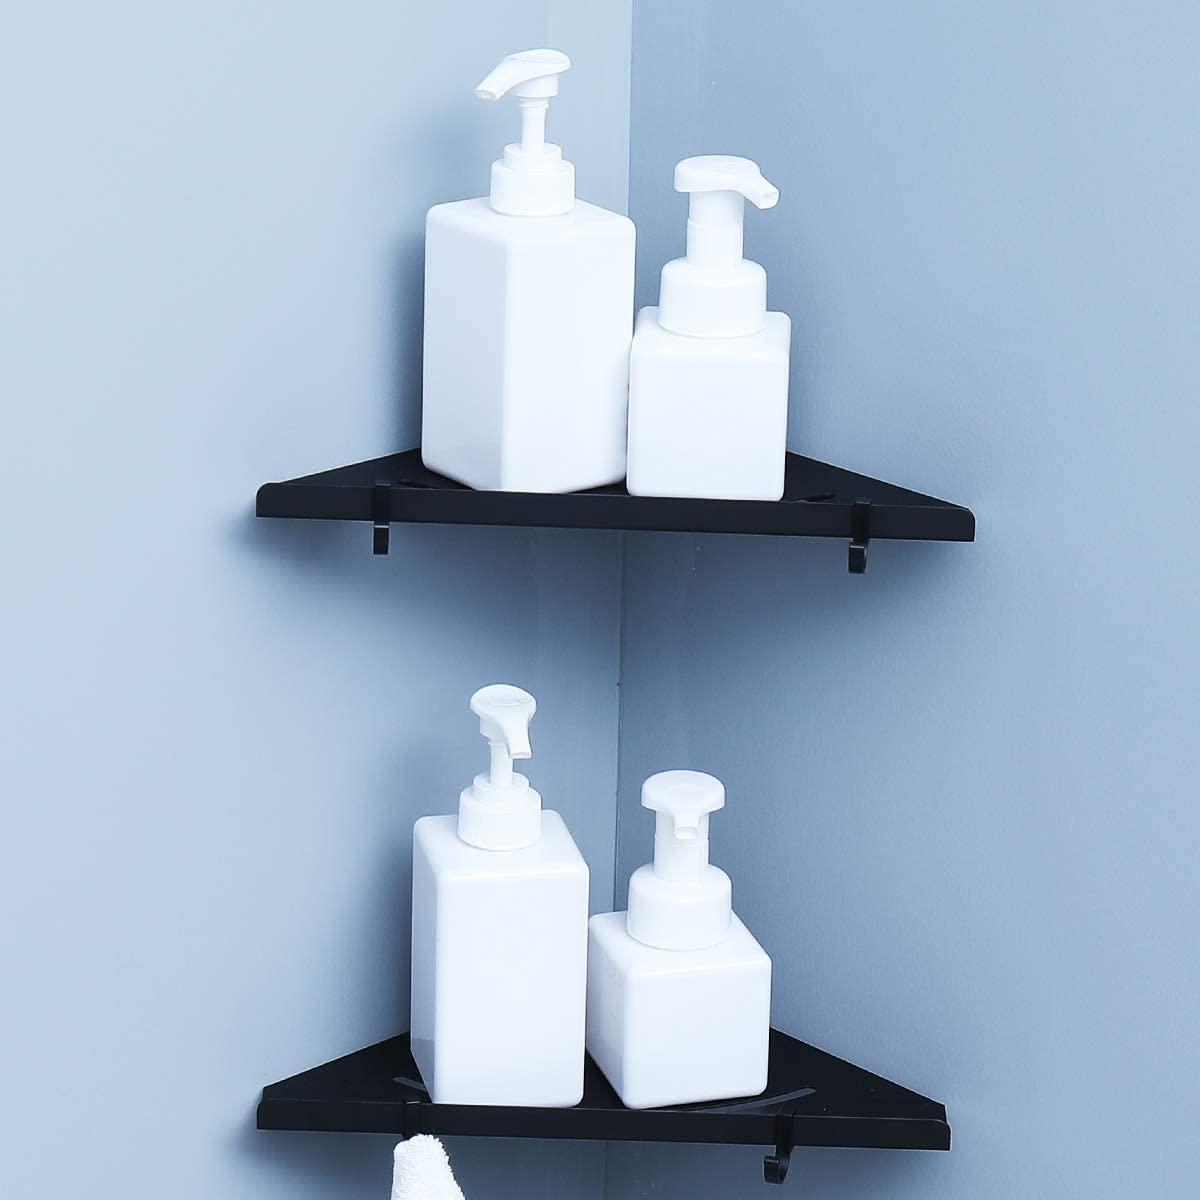 RANK Floating Corner Shelf 2-Pack Corner Shower Caddy for Bathroom Kitchen Storage Organize, No Drilling (Black)